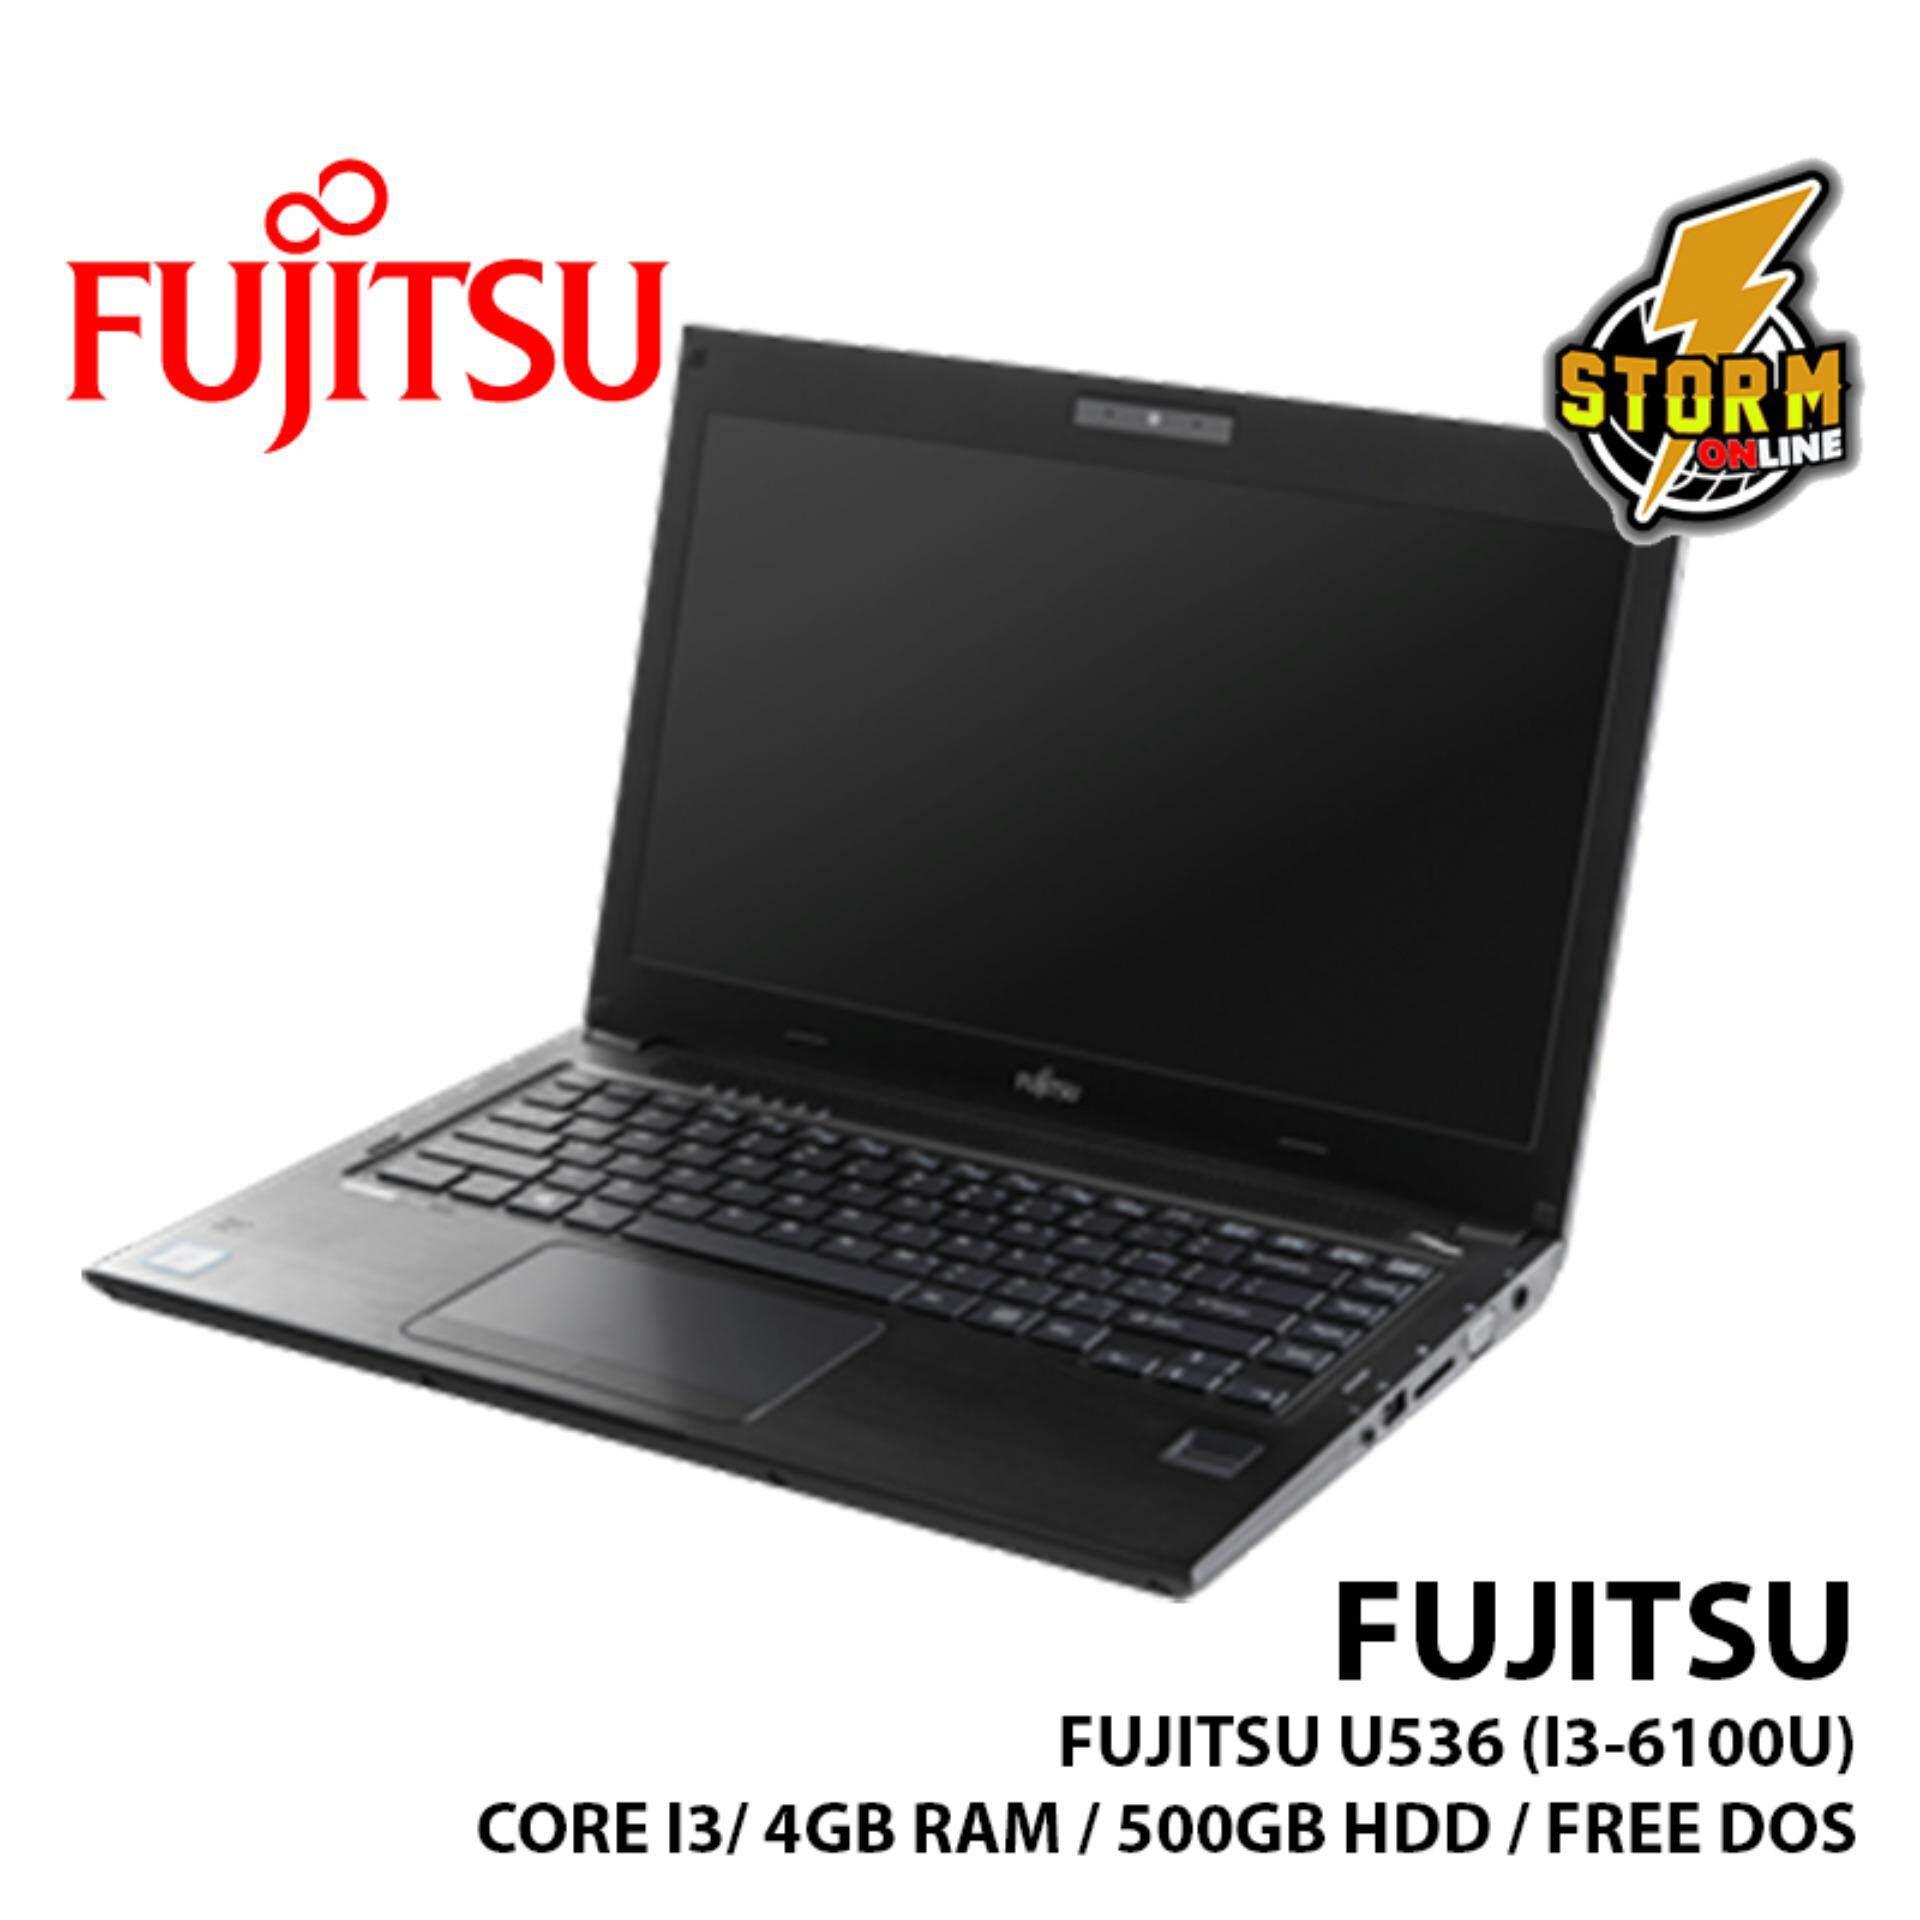 FUJITSU U536 (i3-6100U) NOTEBOOK (CORE I3/ 4GB RAM/ 500GB HDD/ FREE DOS) Malaysia